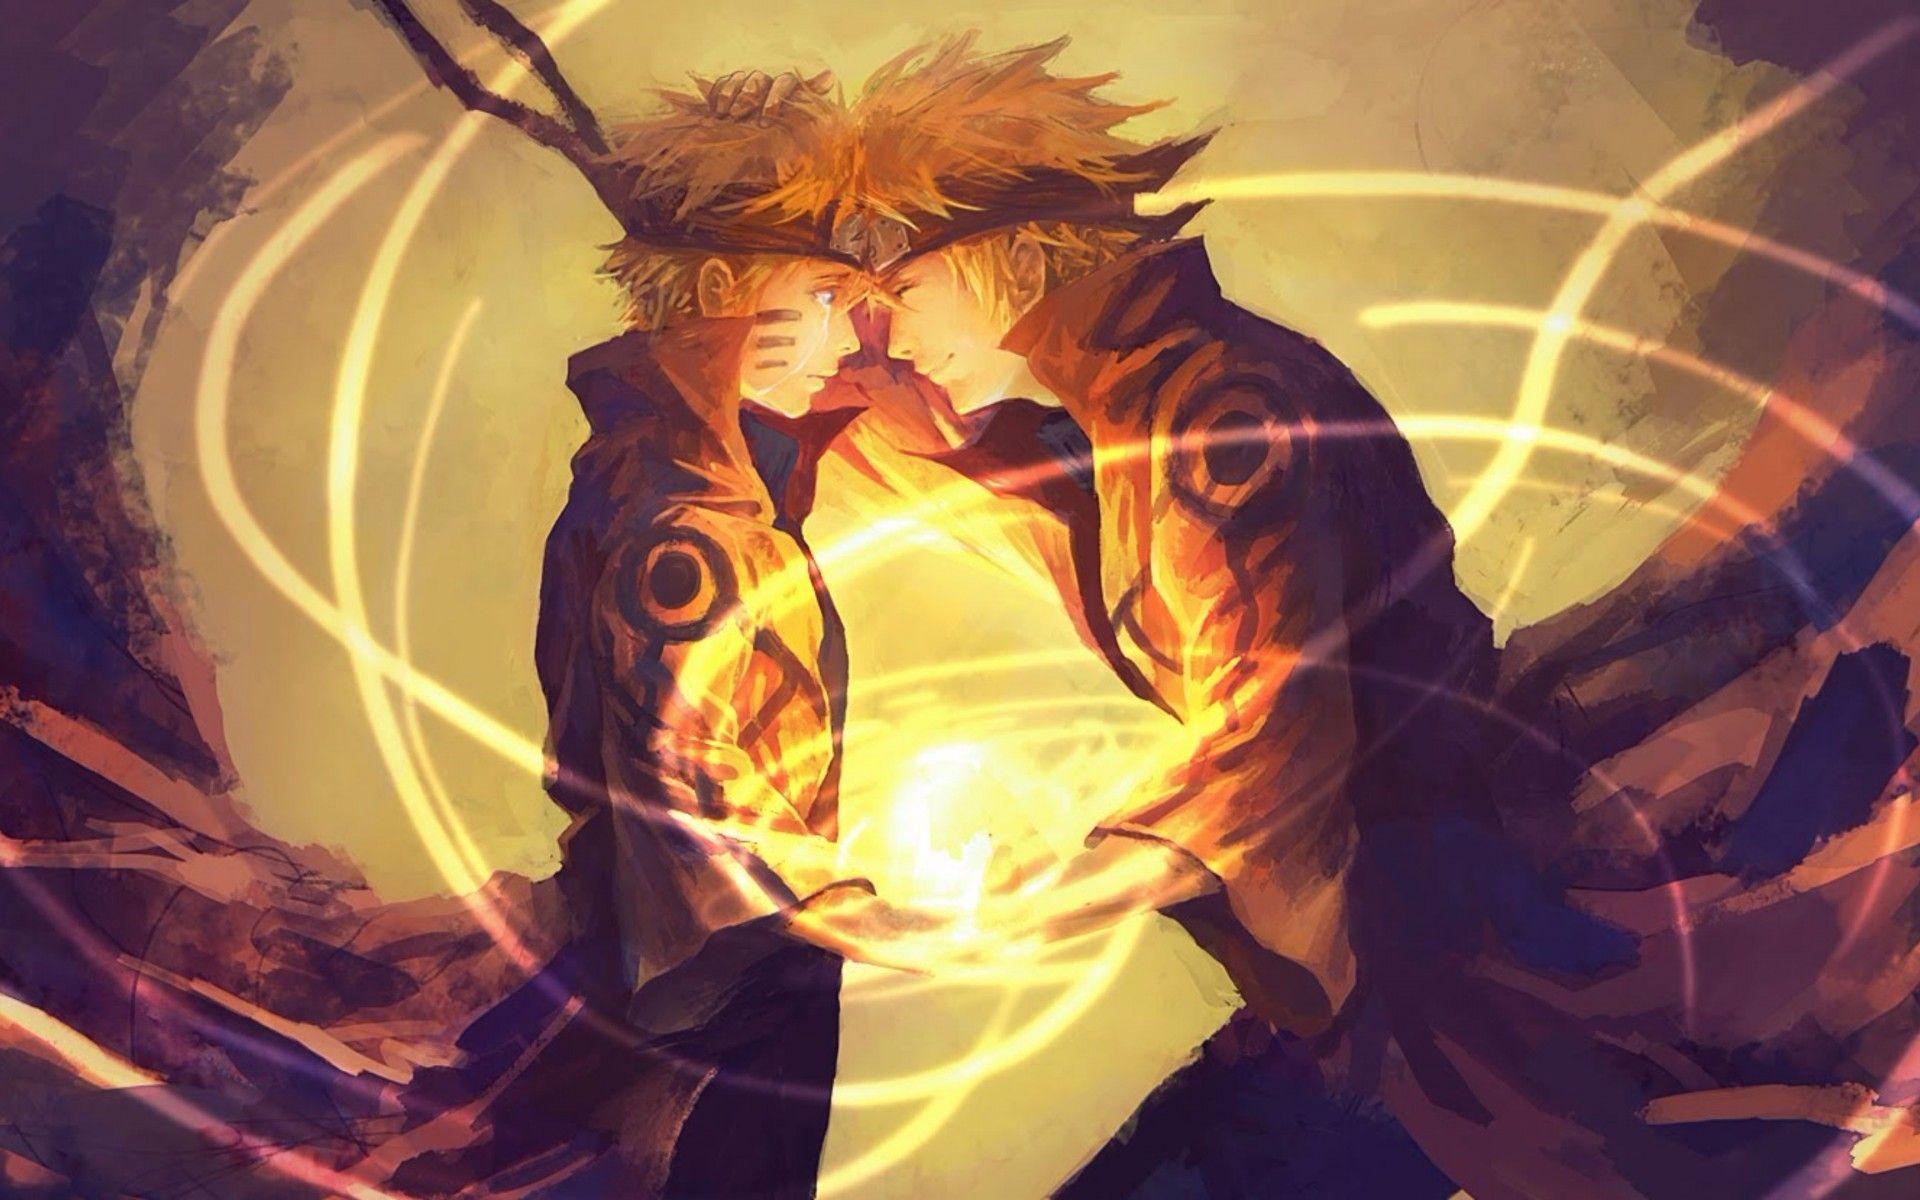 Fantastic Wallpaper Naruto Emotional - fc33ec111cb403f0b15ba02afcbdf988  Graphic_25771.jpg